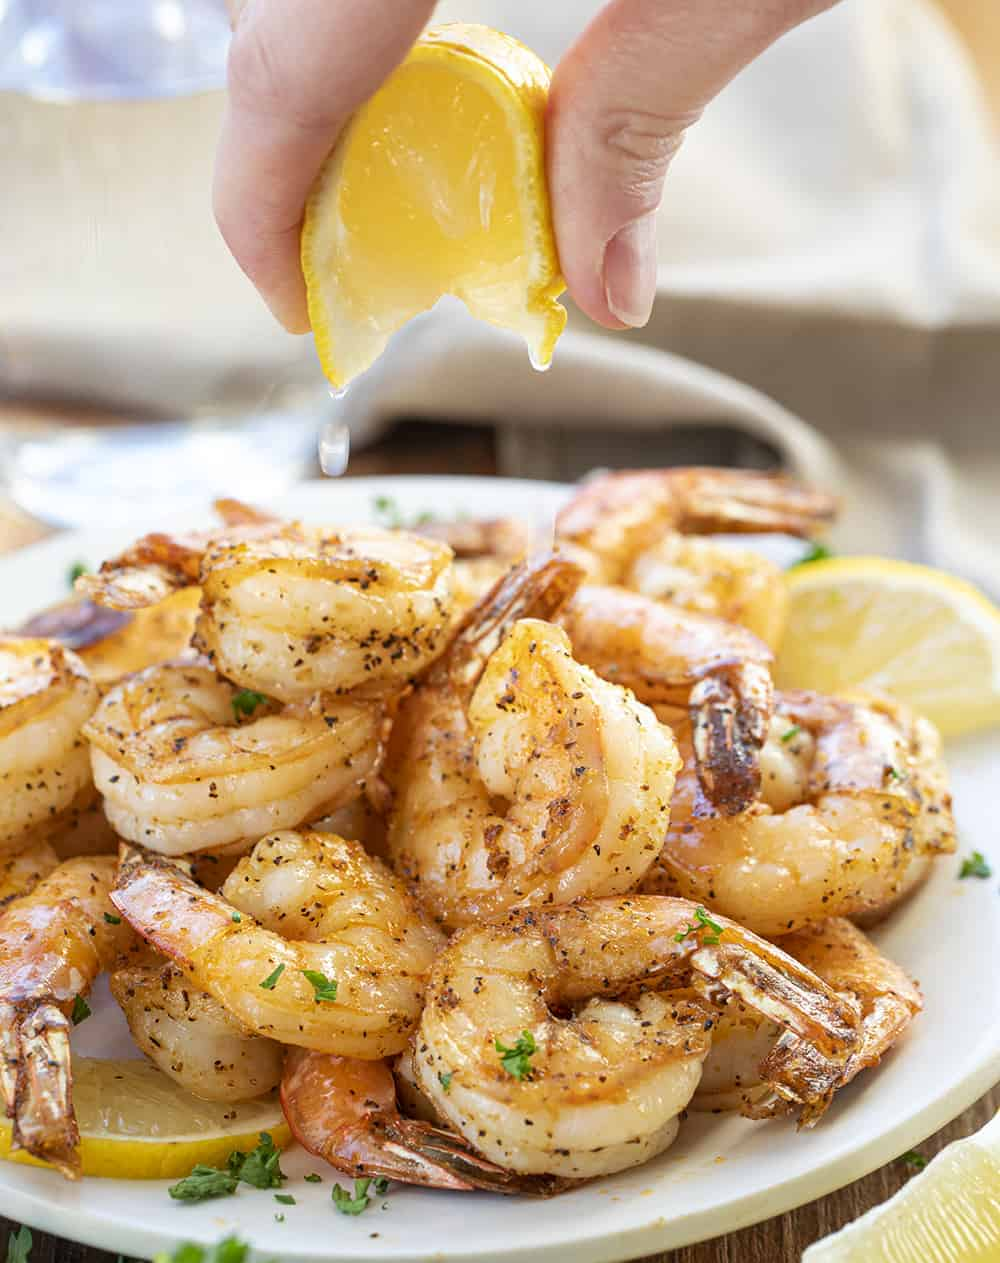 Squeezing Lemon over Air Fryer Shrimp